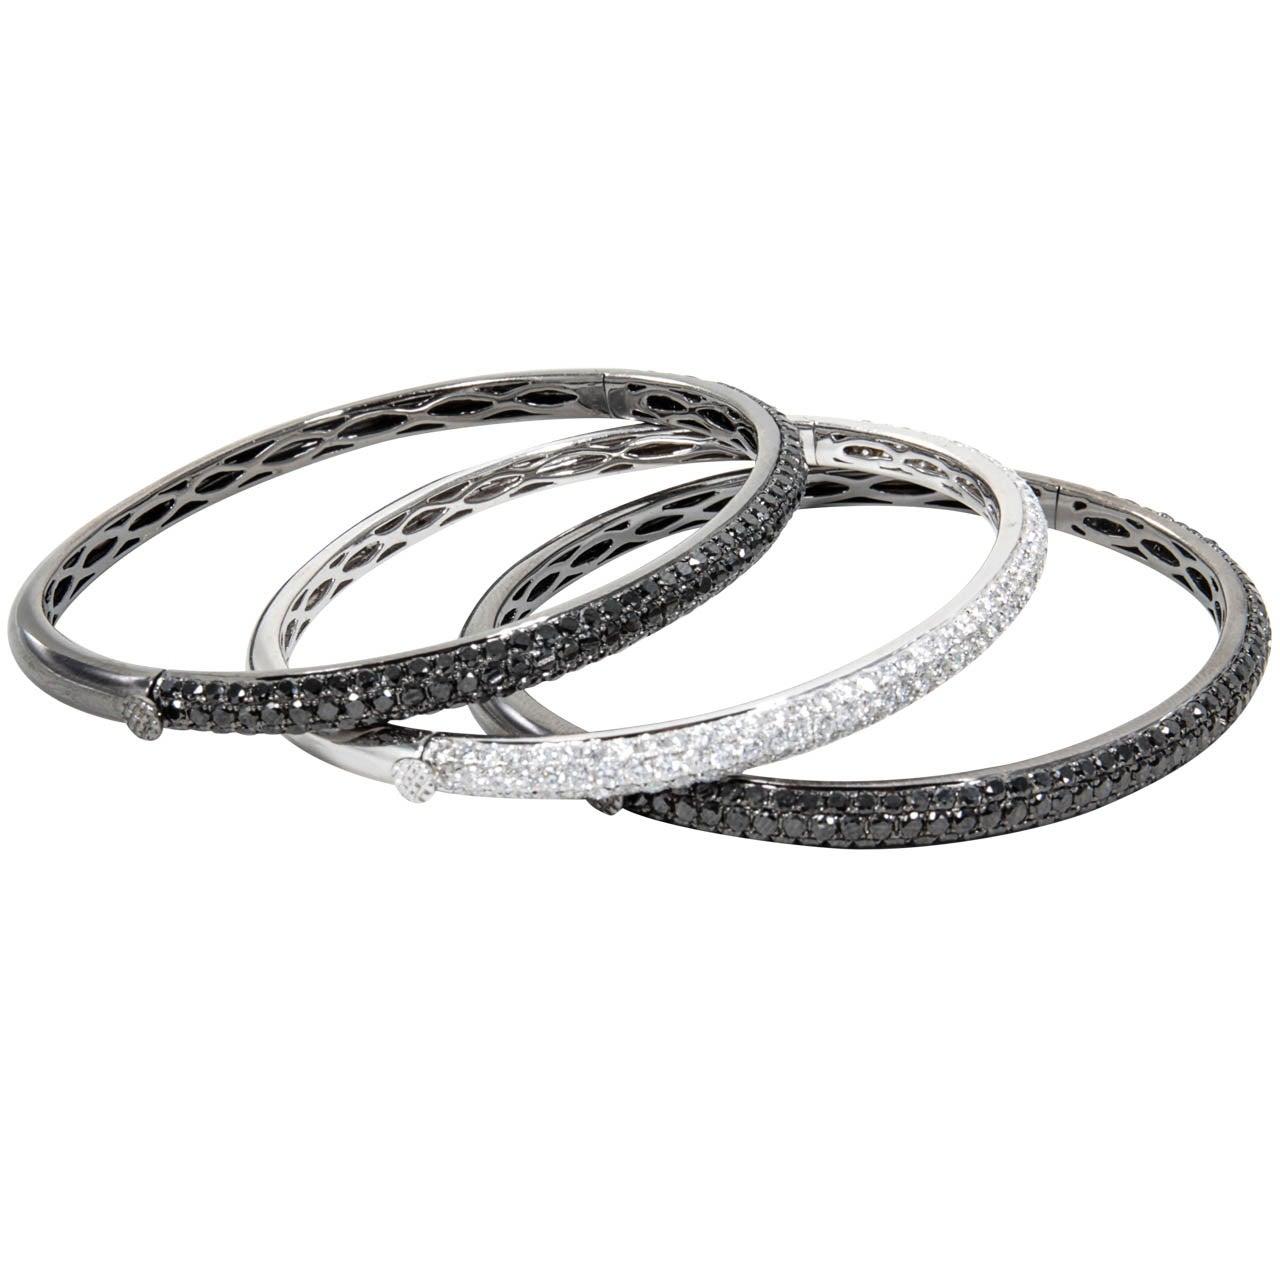 Set of Black and White Diamond Bangle Bracelets